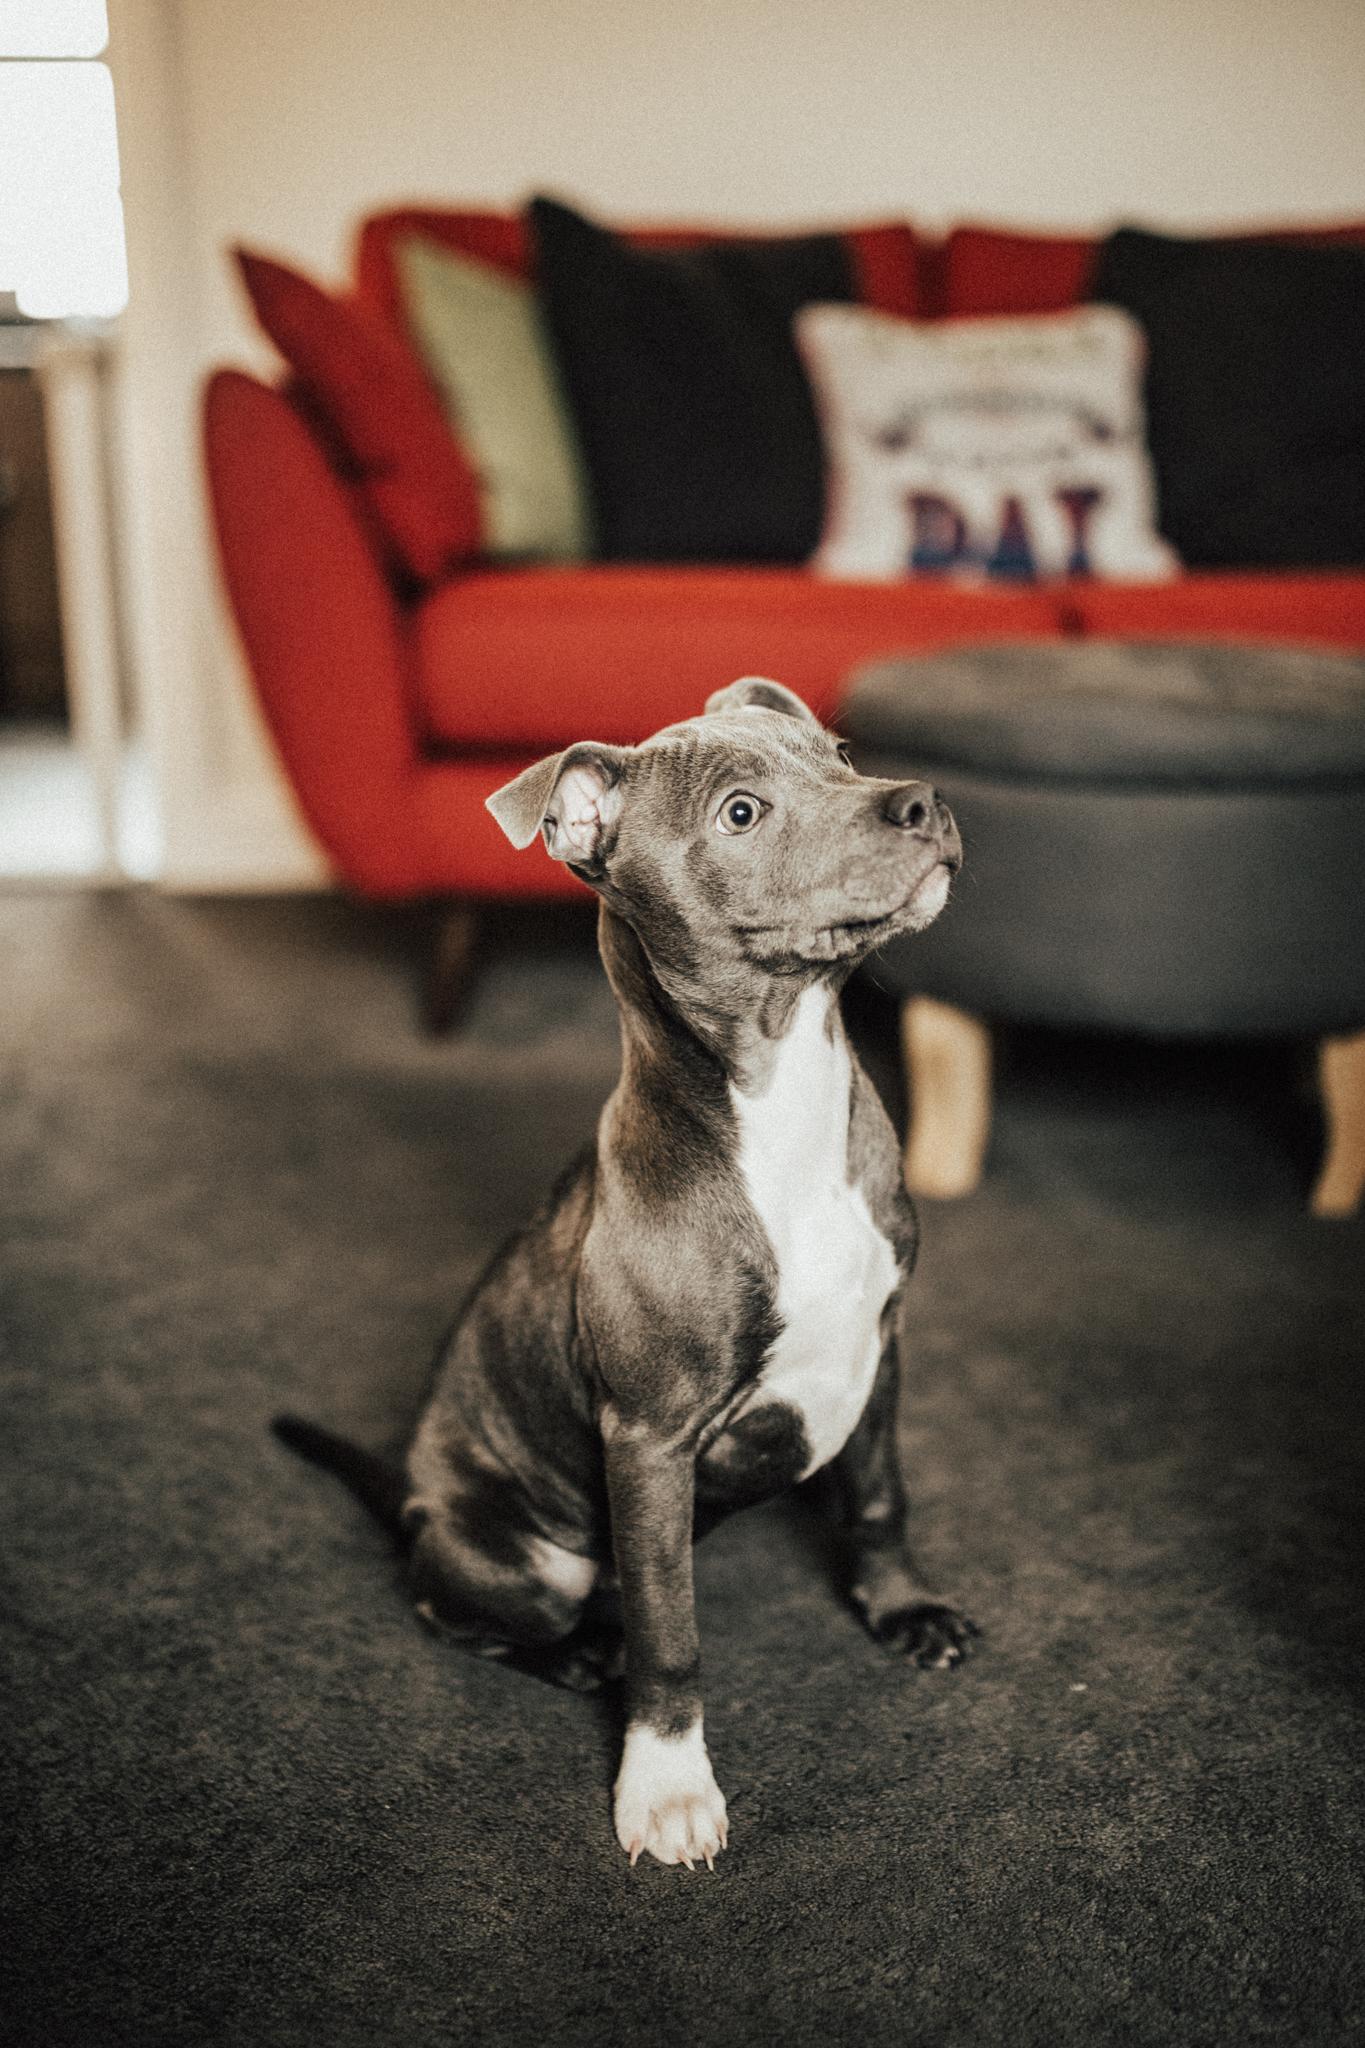 Dog-Human-Session-Photography-Darina-Stoda-Animal-Indigo-2.jpg